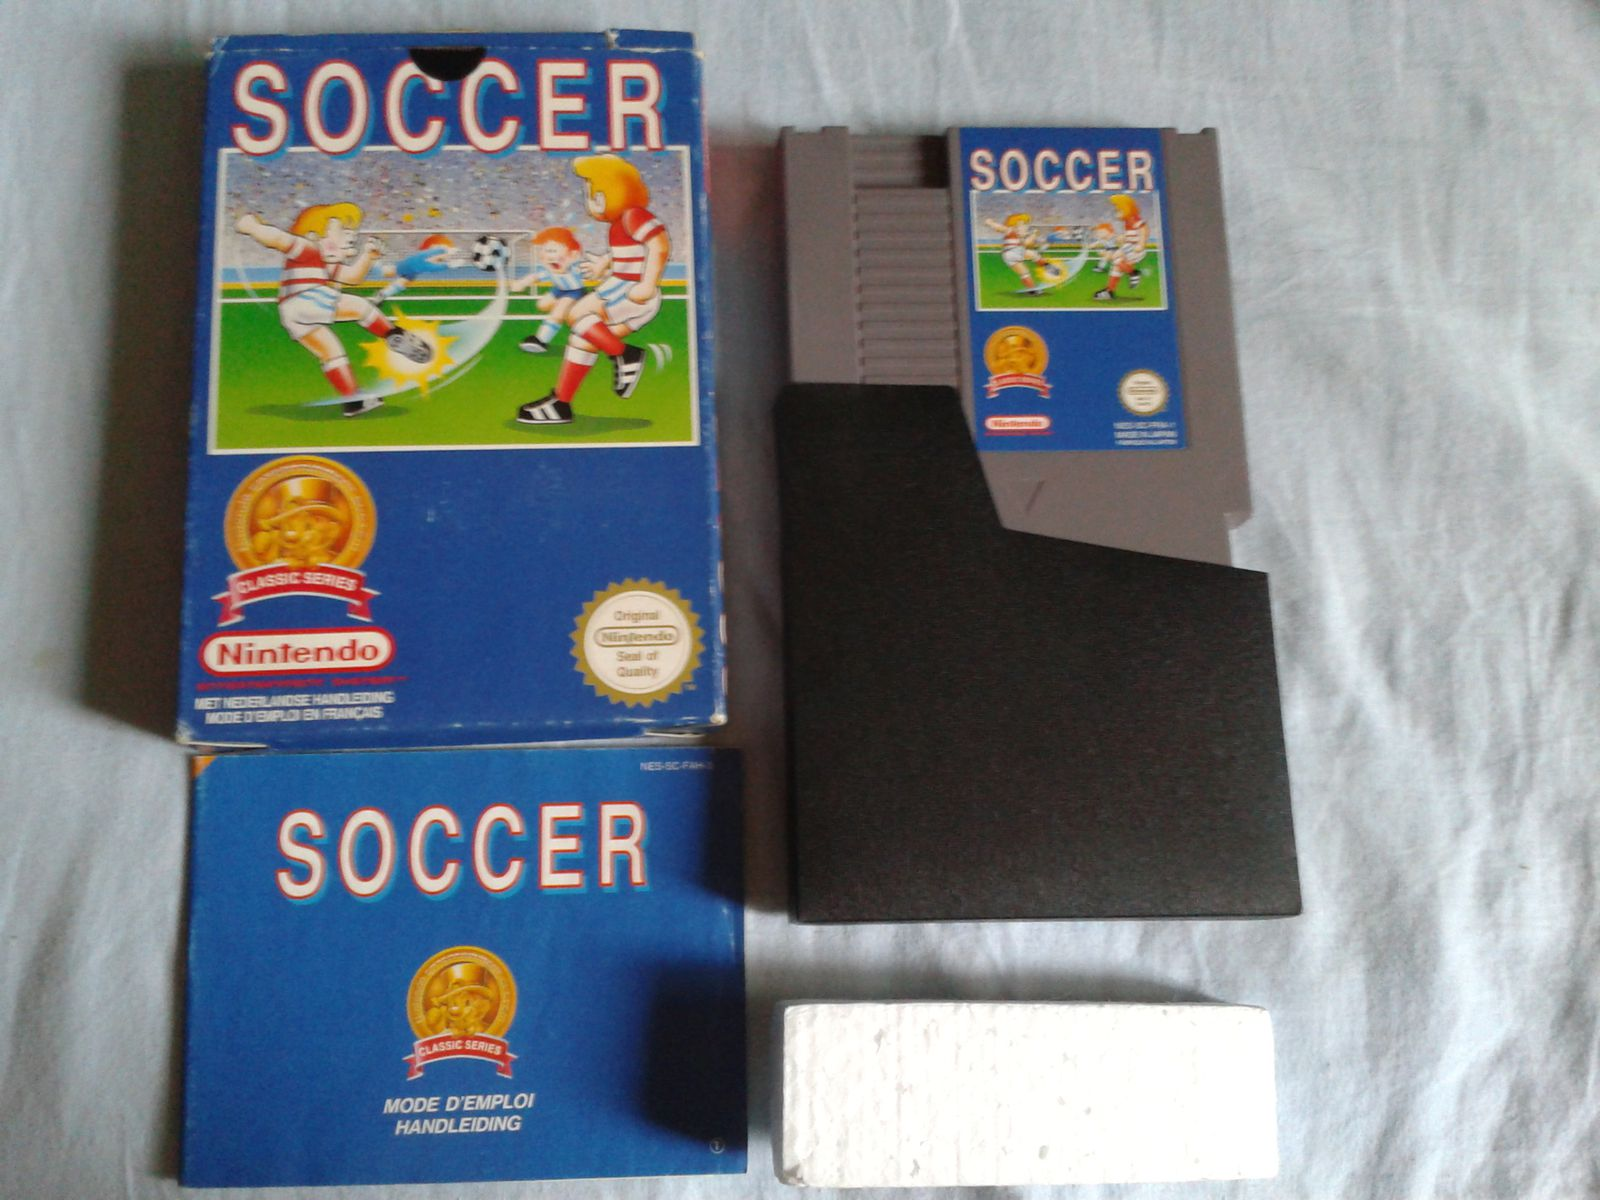 Soccer (Classic series)